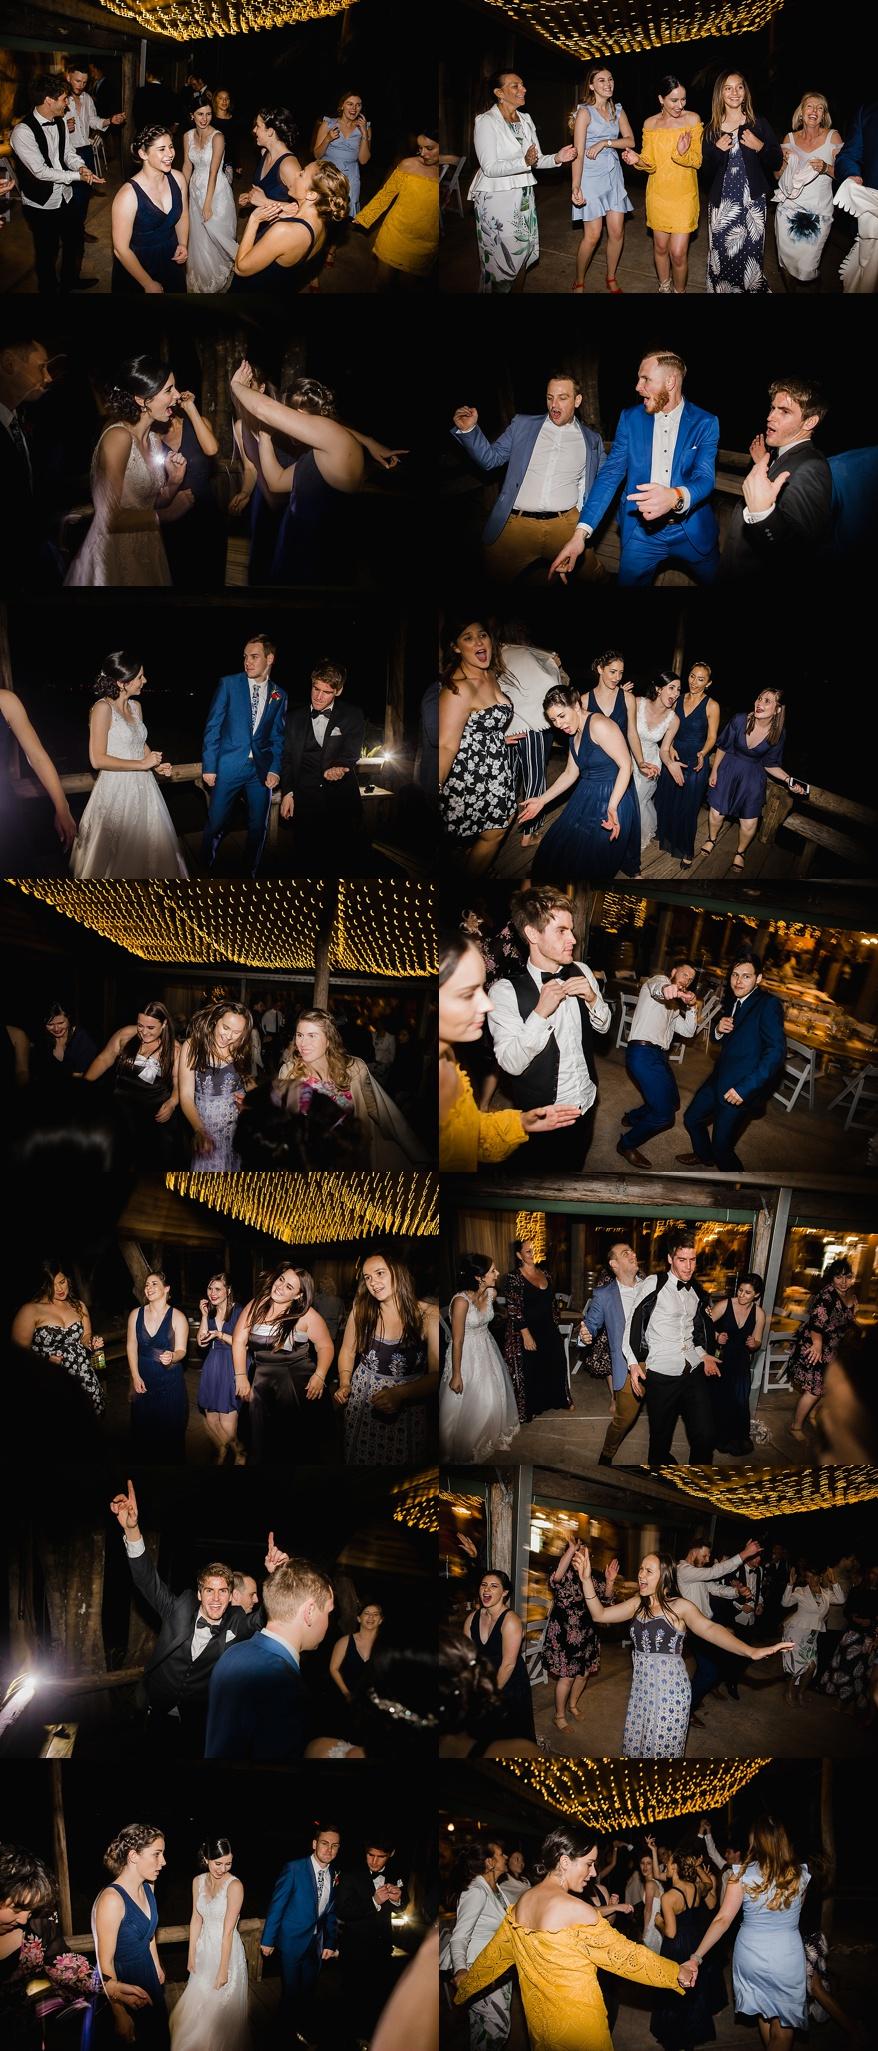 Wedding_Dancing_photos_Boomerang_Farm.jpg